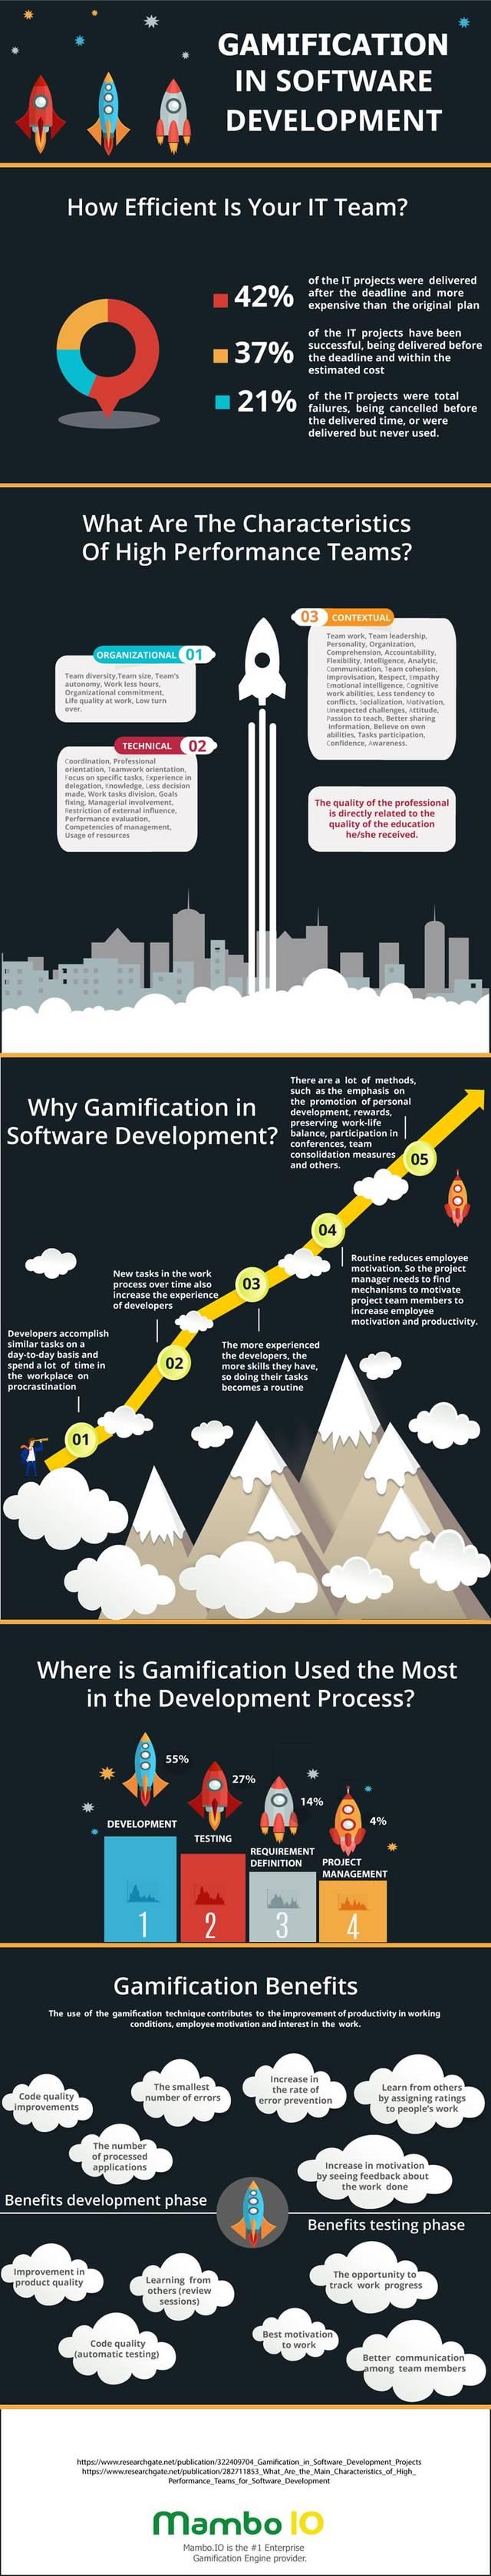 Development gamification infographic